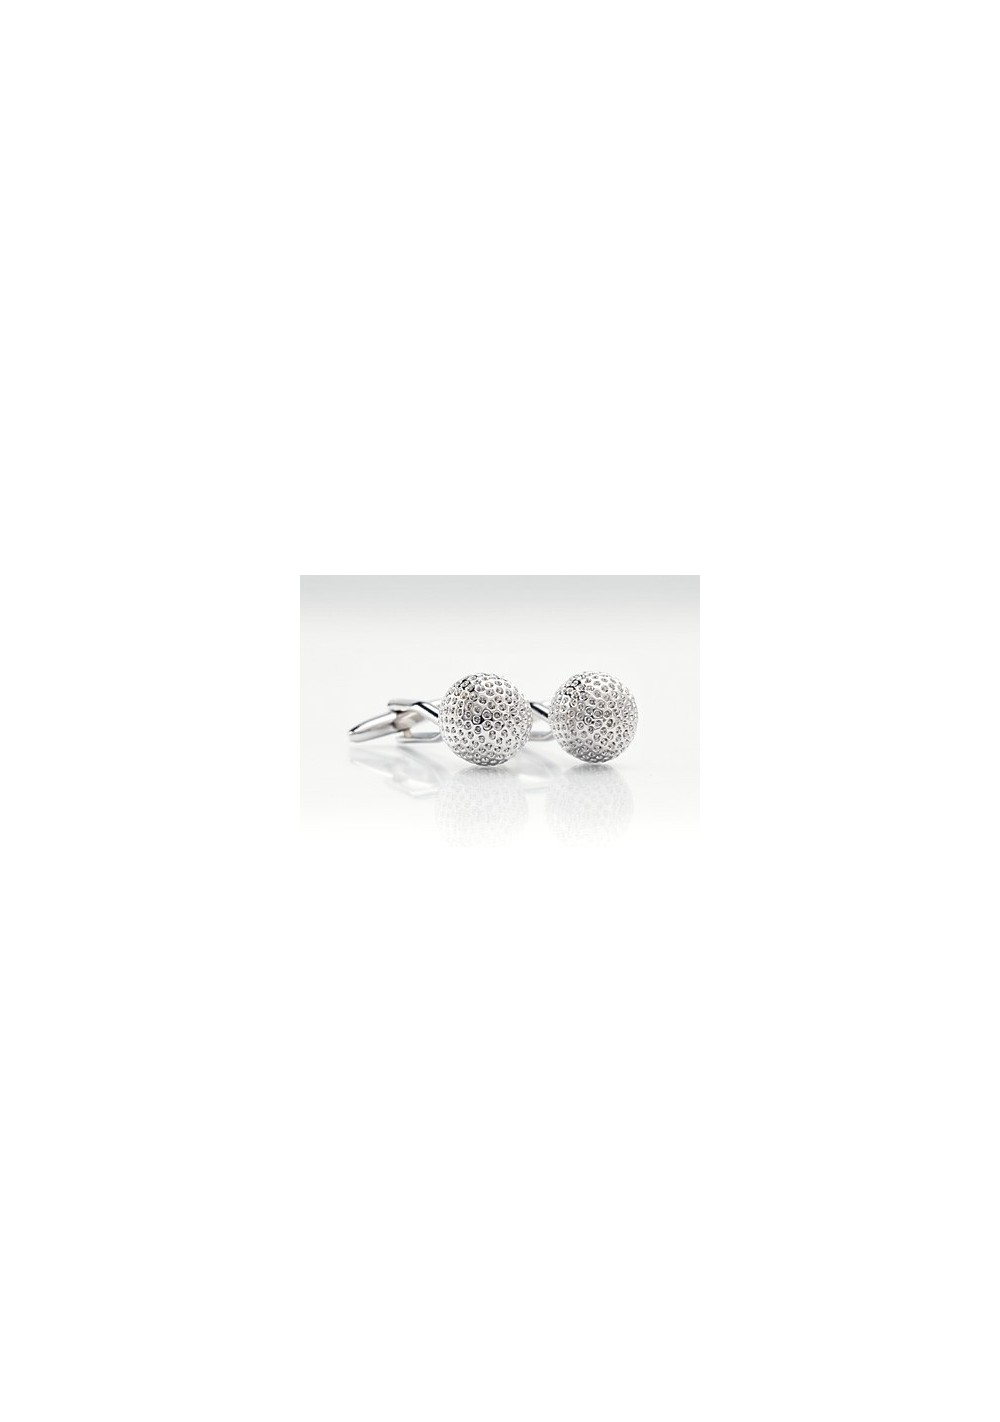 Golfball Cufflinks - Silver designer cufflinks by Mont Pellier